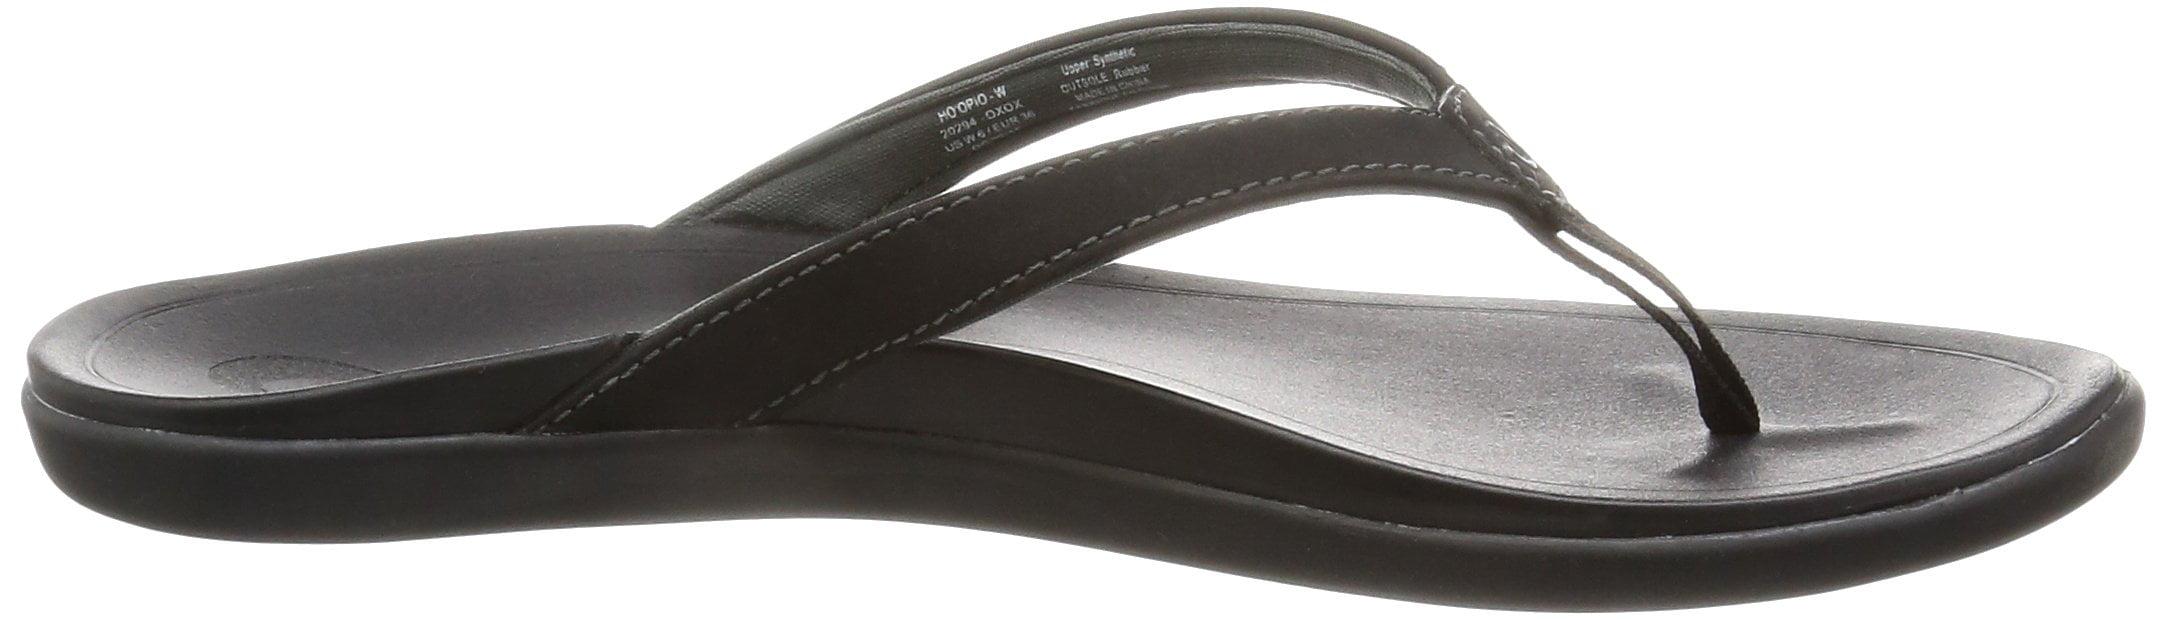 Travel Knit Tank Top stretchy BLACK NEW no-iron poly//span #211BN